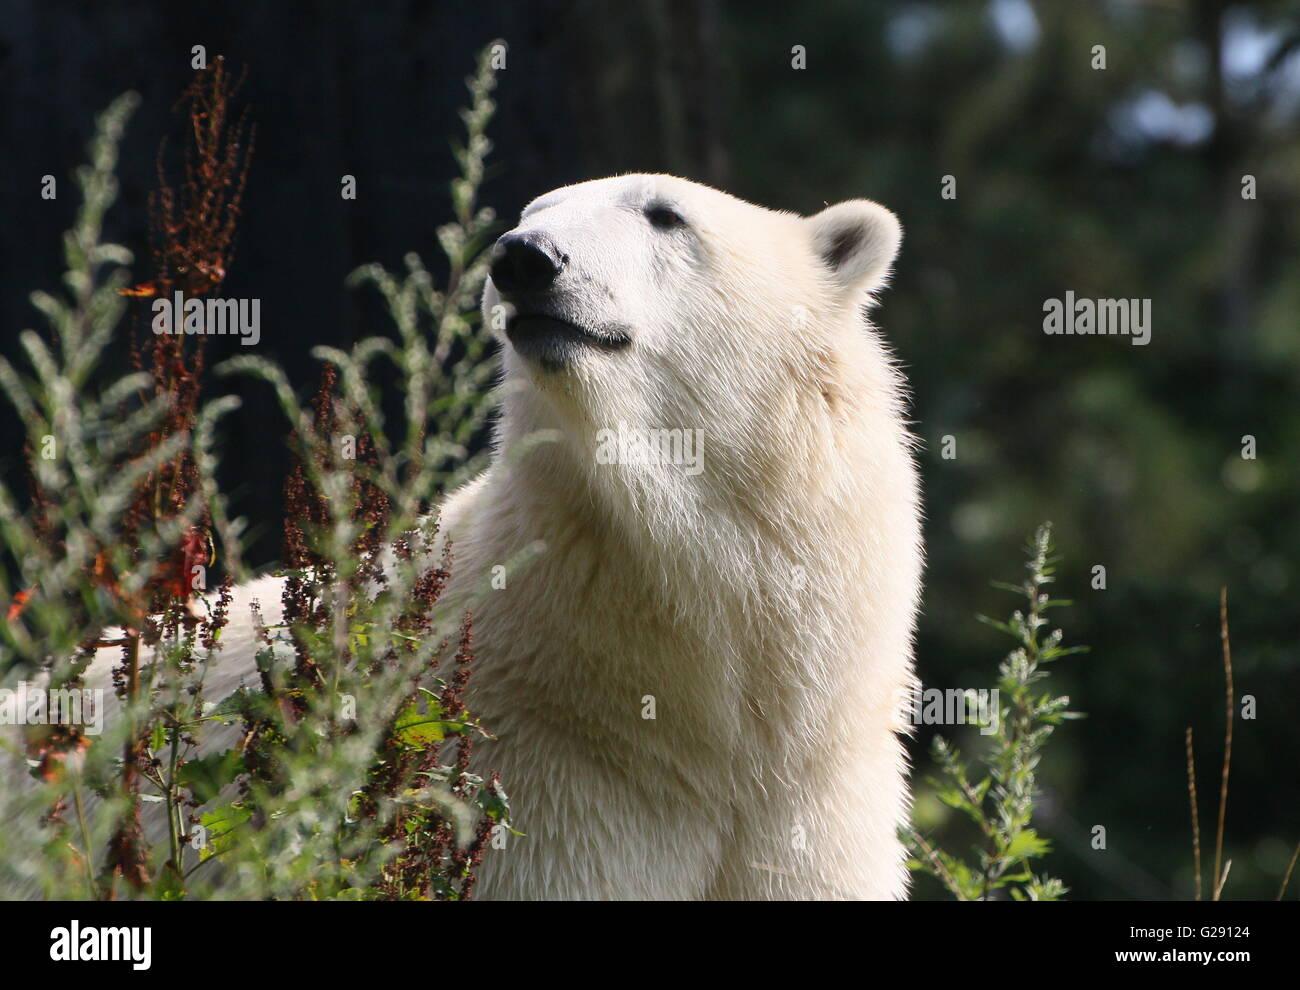 Femmina matura orso polare (Ursus maritimus) in una naturale estate impostazione, a basso punto di vista Immagini Stock